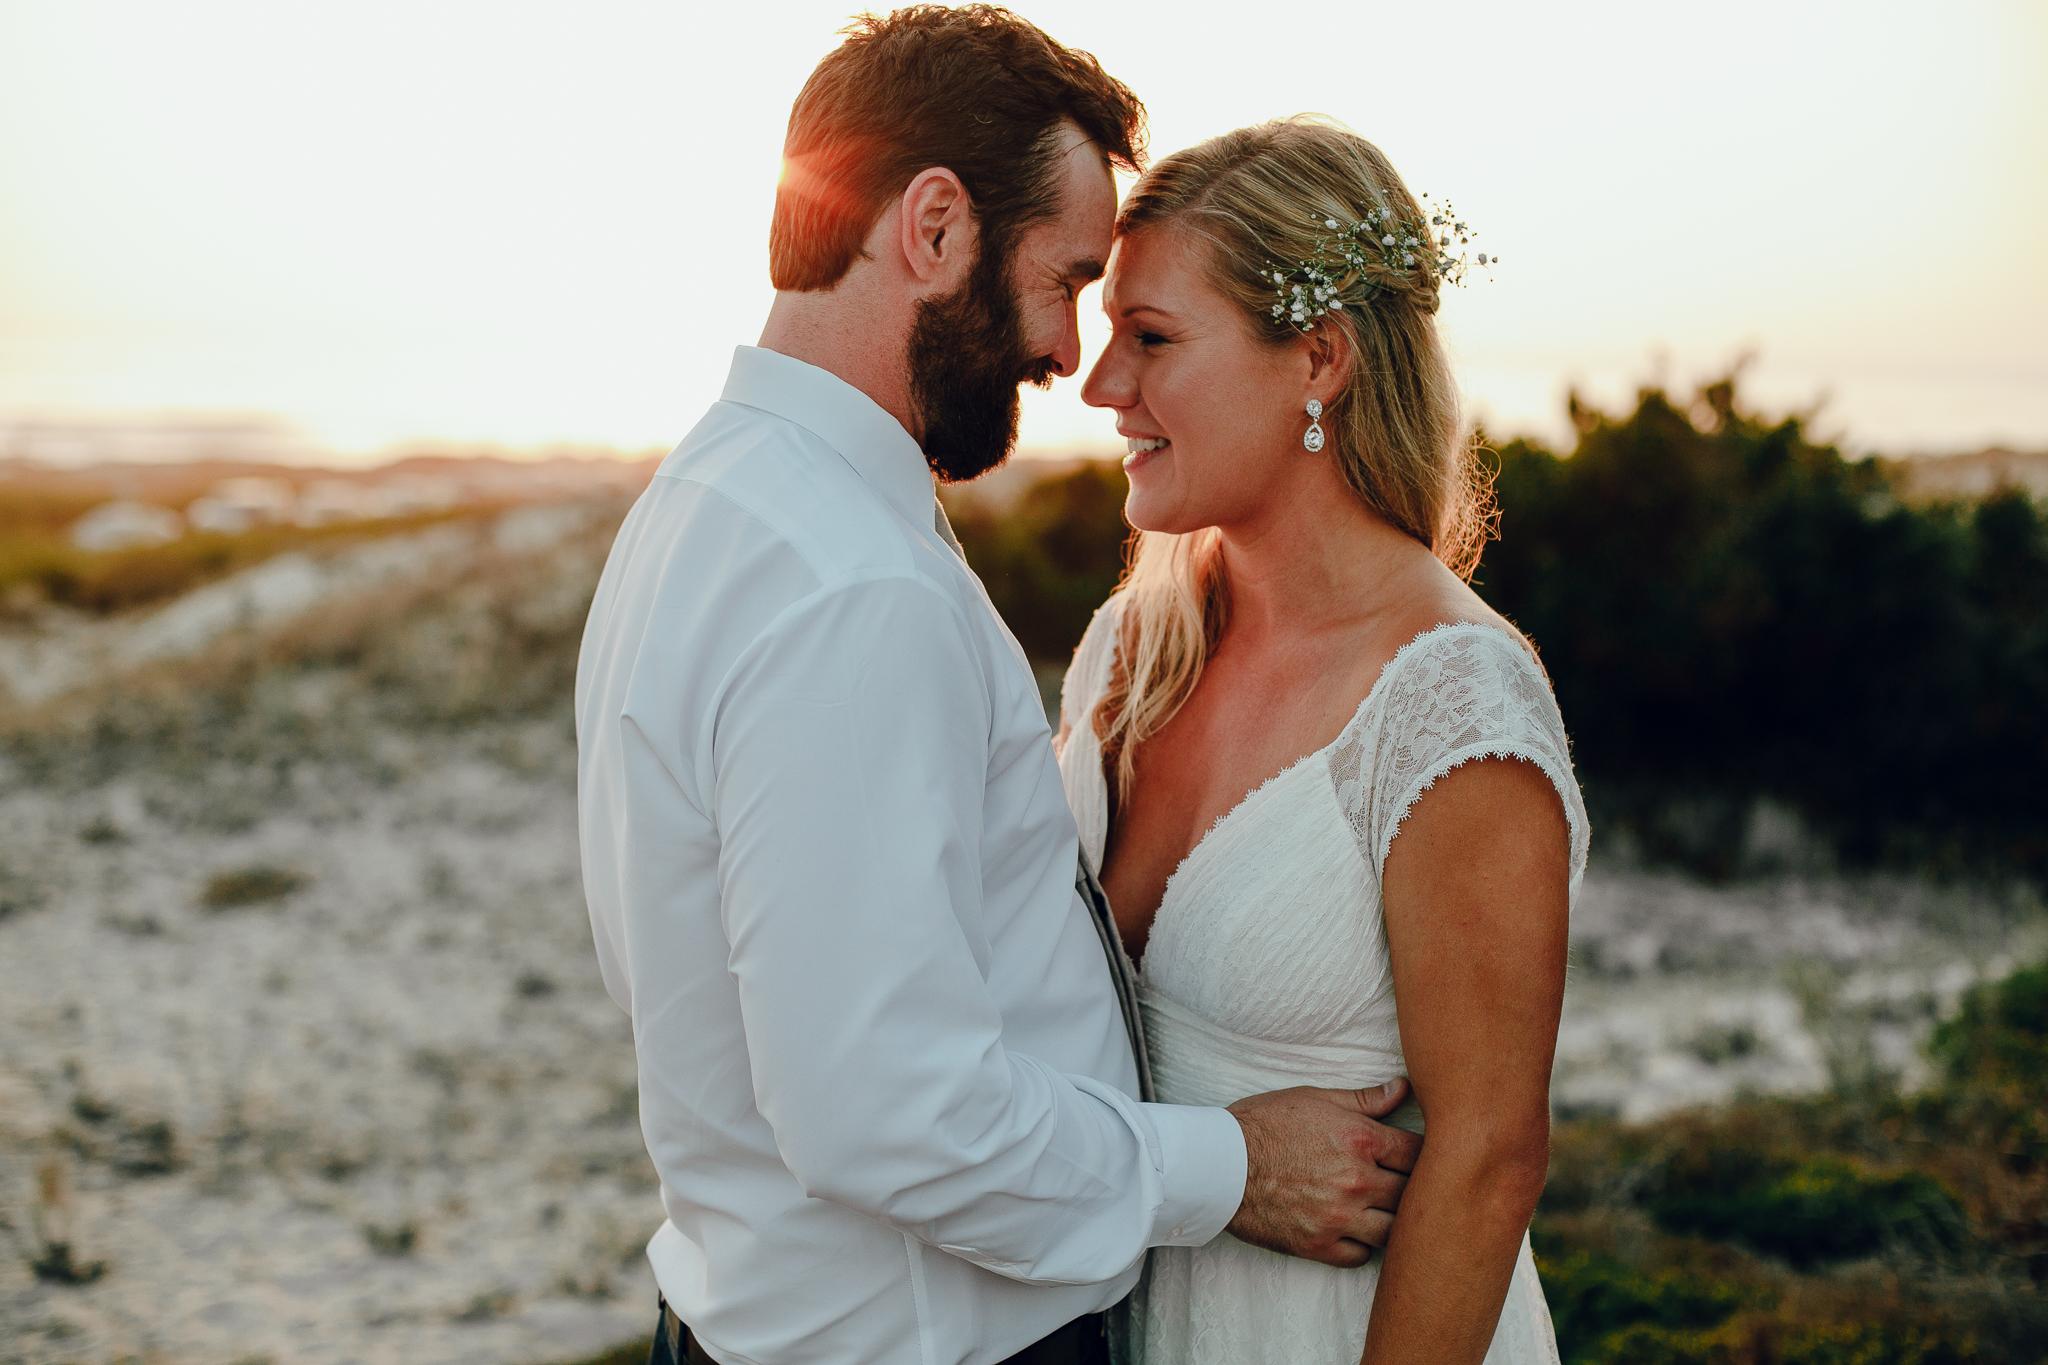 Archer_Inspired_Photography_Pacific_Grove_Ansilomar_Beach_Carmel_Valley_Wedding-178.jpg